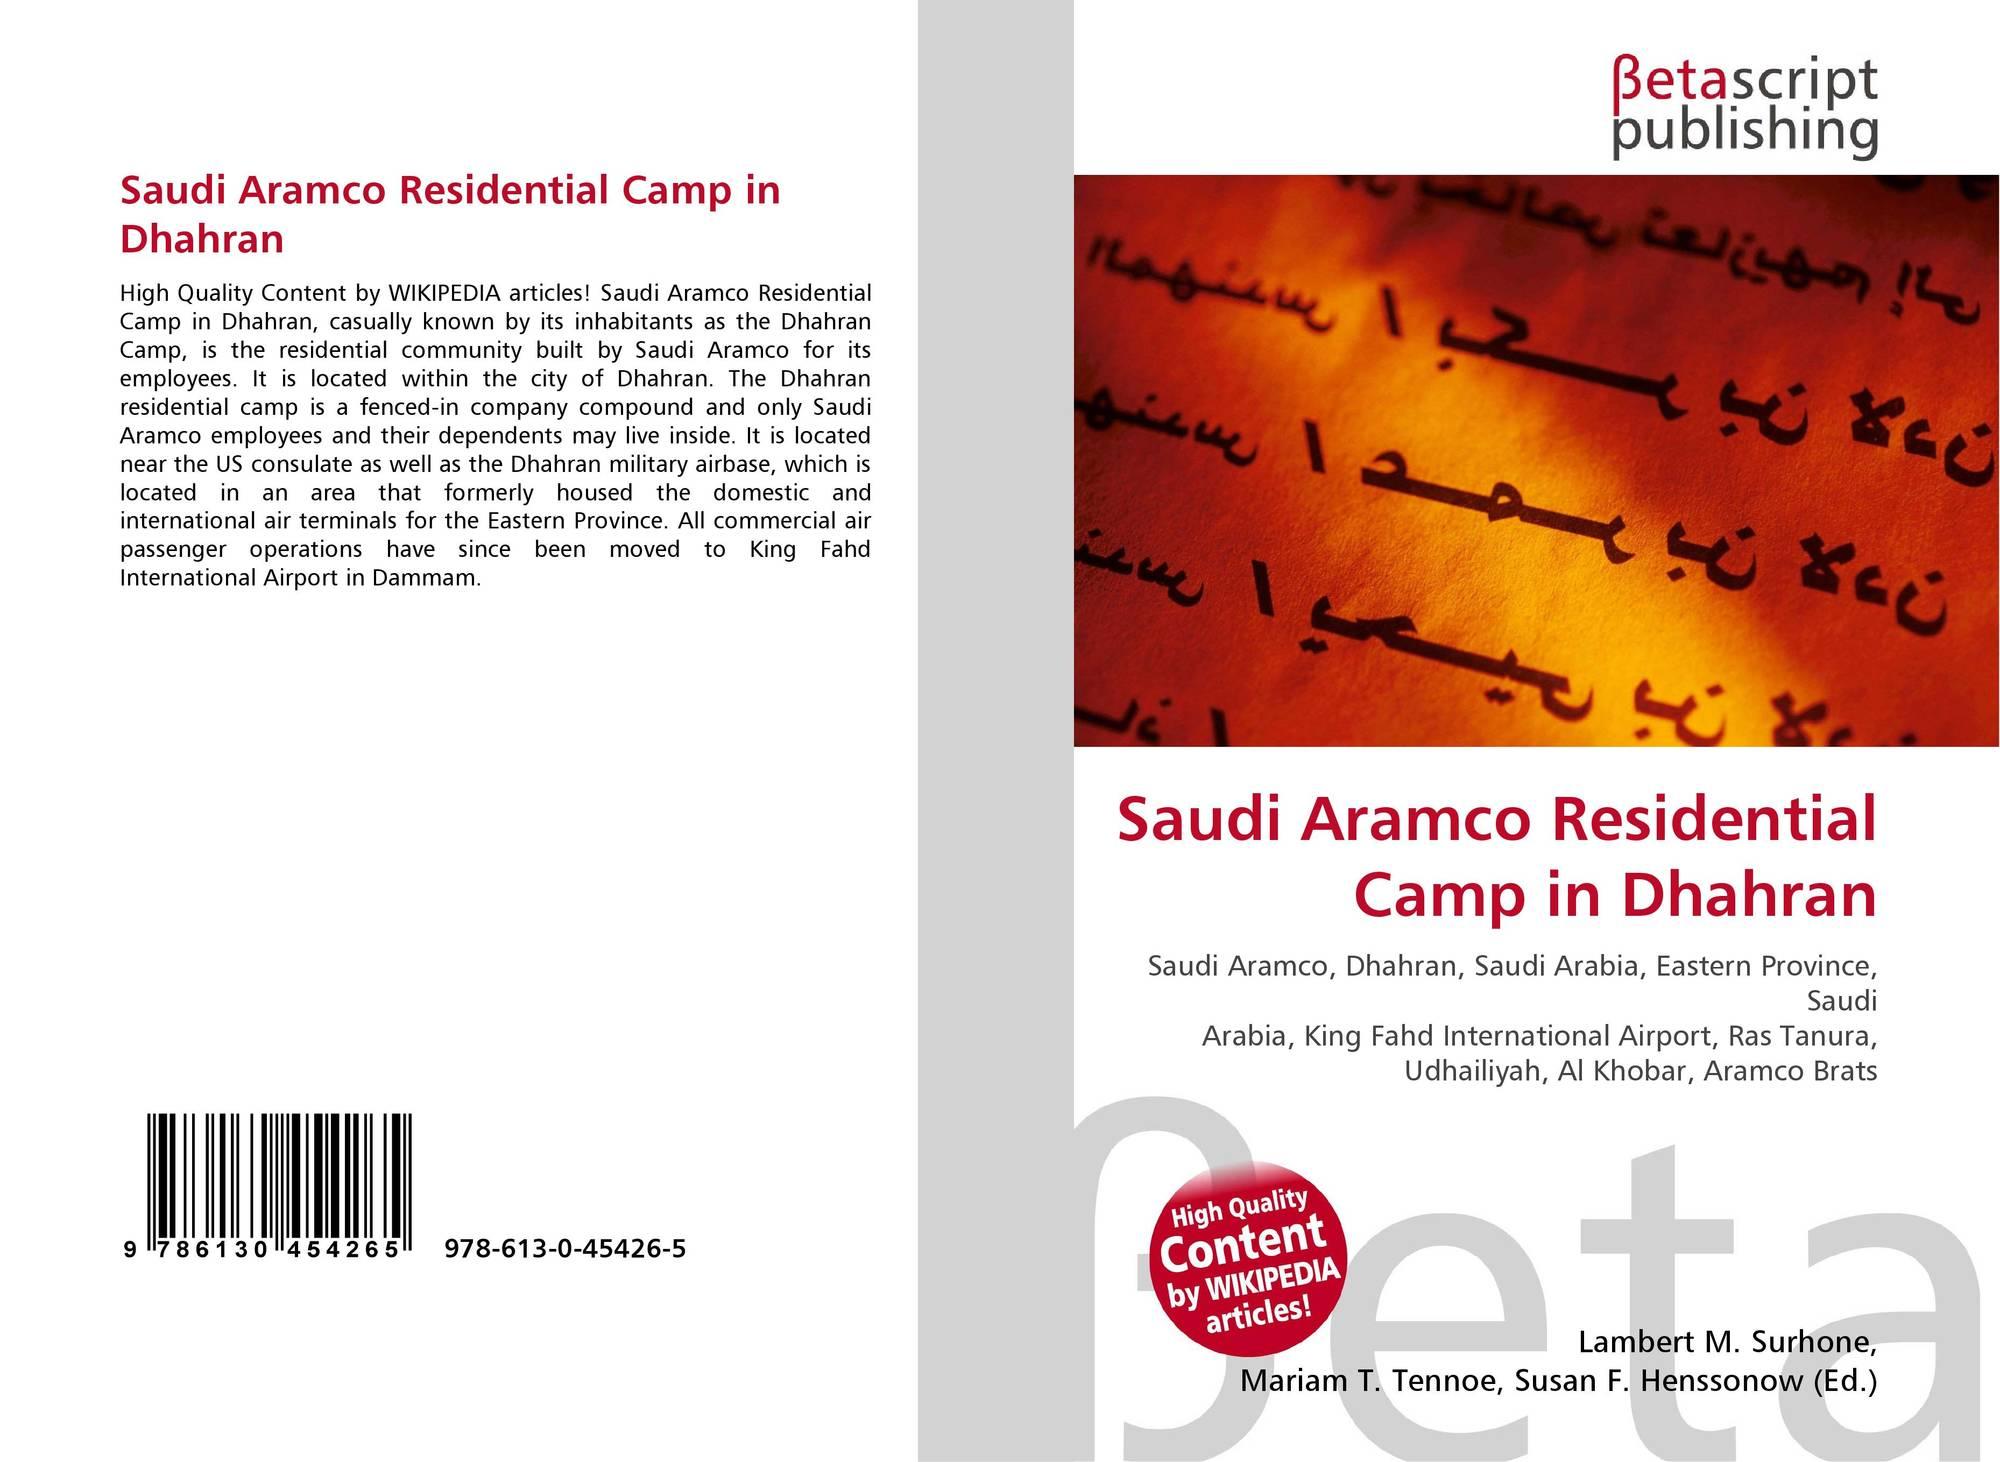 Saudi Aramco Residential Camp in Dhahran, 978-613-0-45426-5